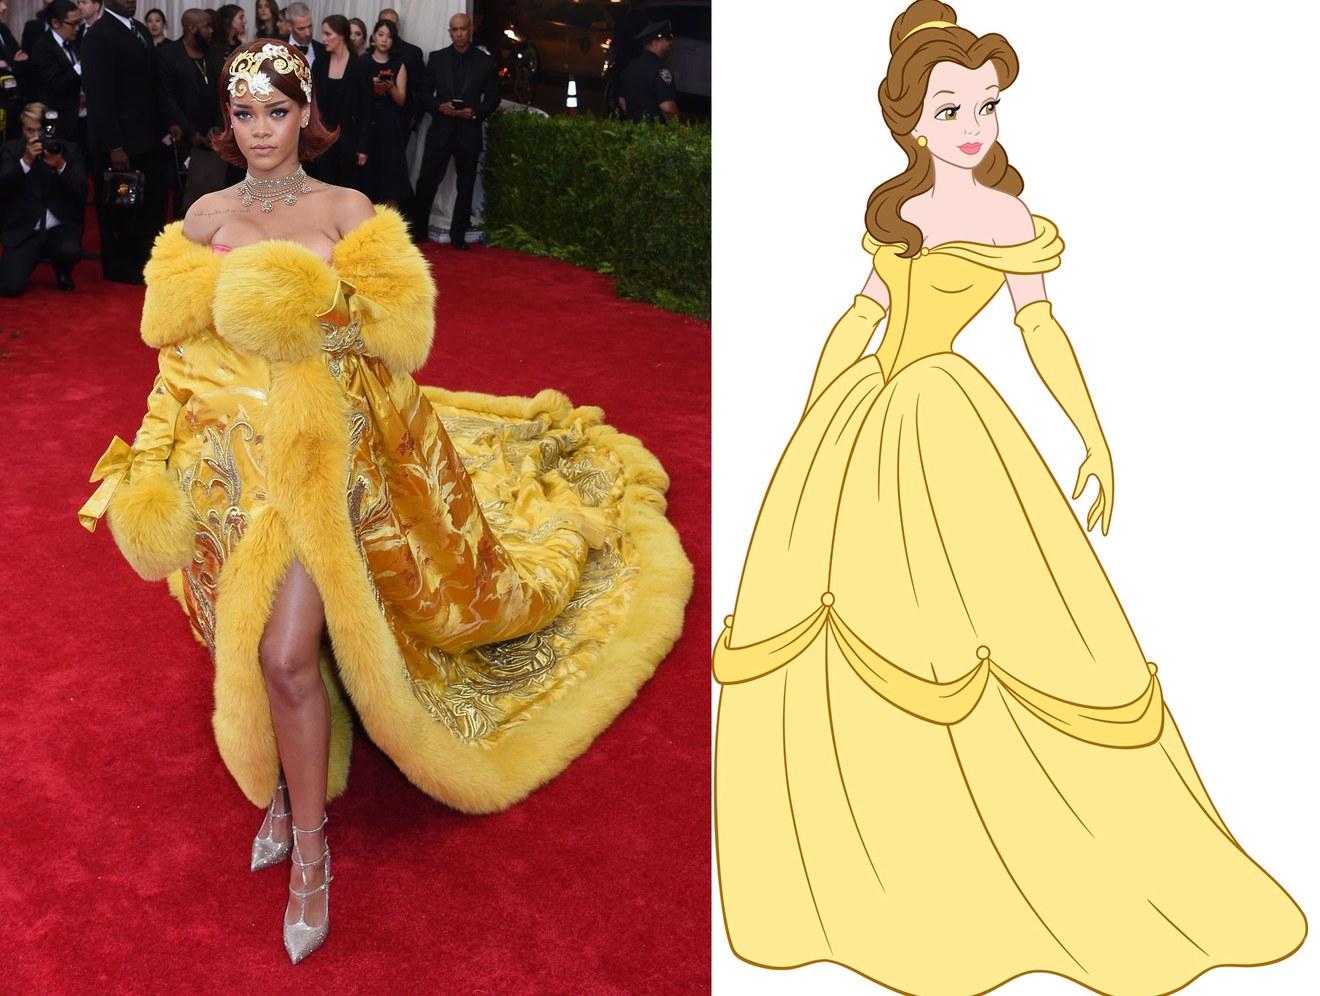 Tech Media Tainment Disney Princesses Reimagined As Abuse Victims Transgender Cats Rihanna